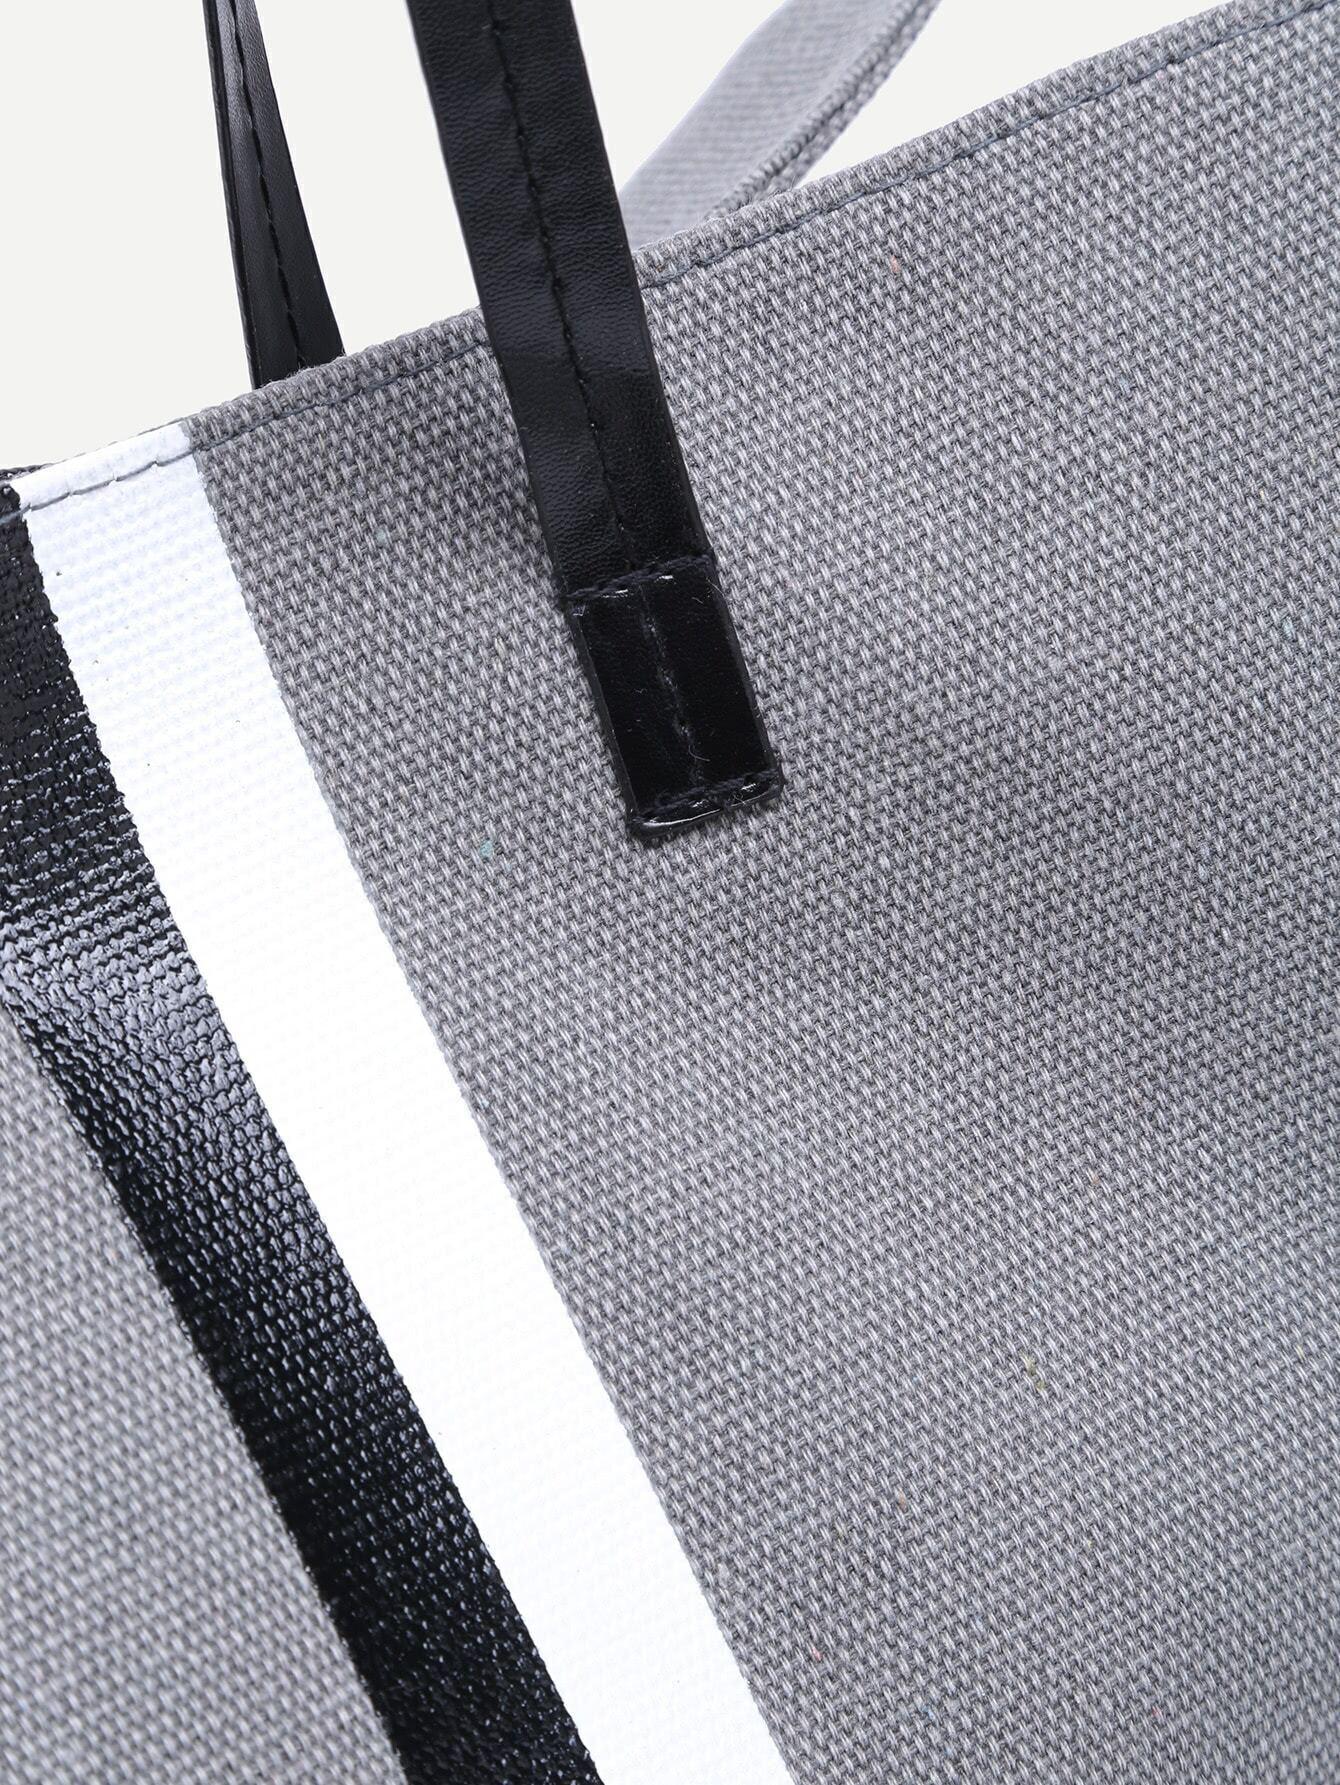 bag161025305_2